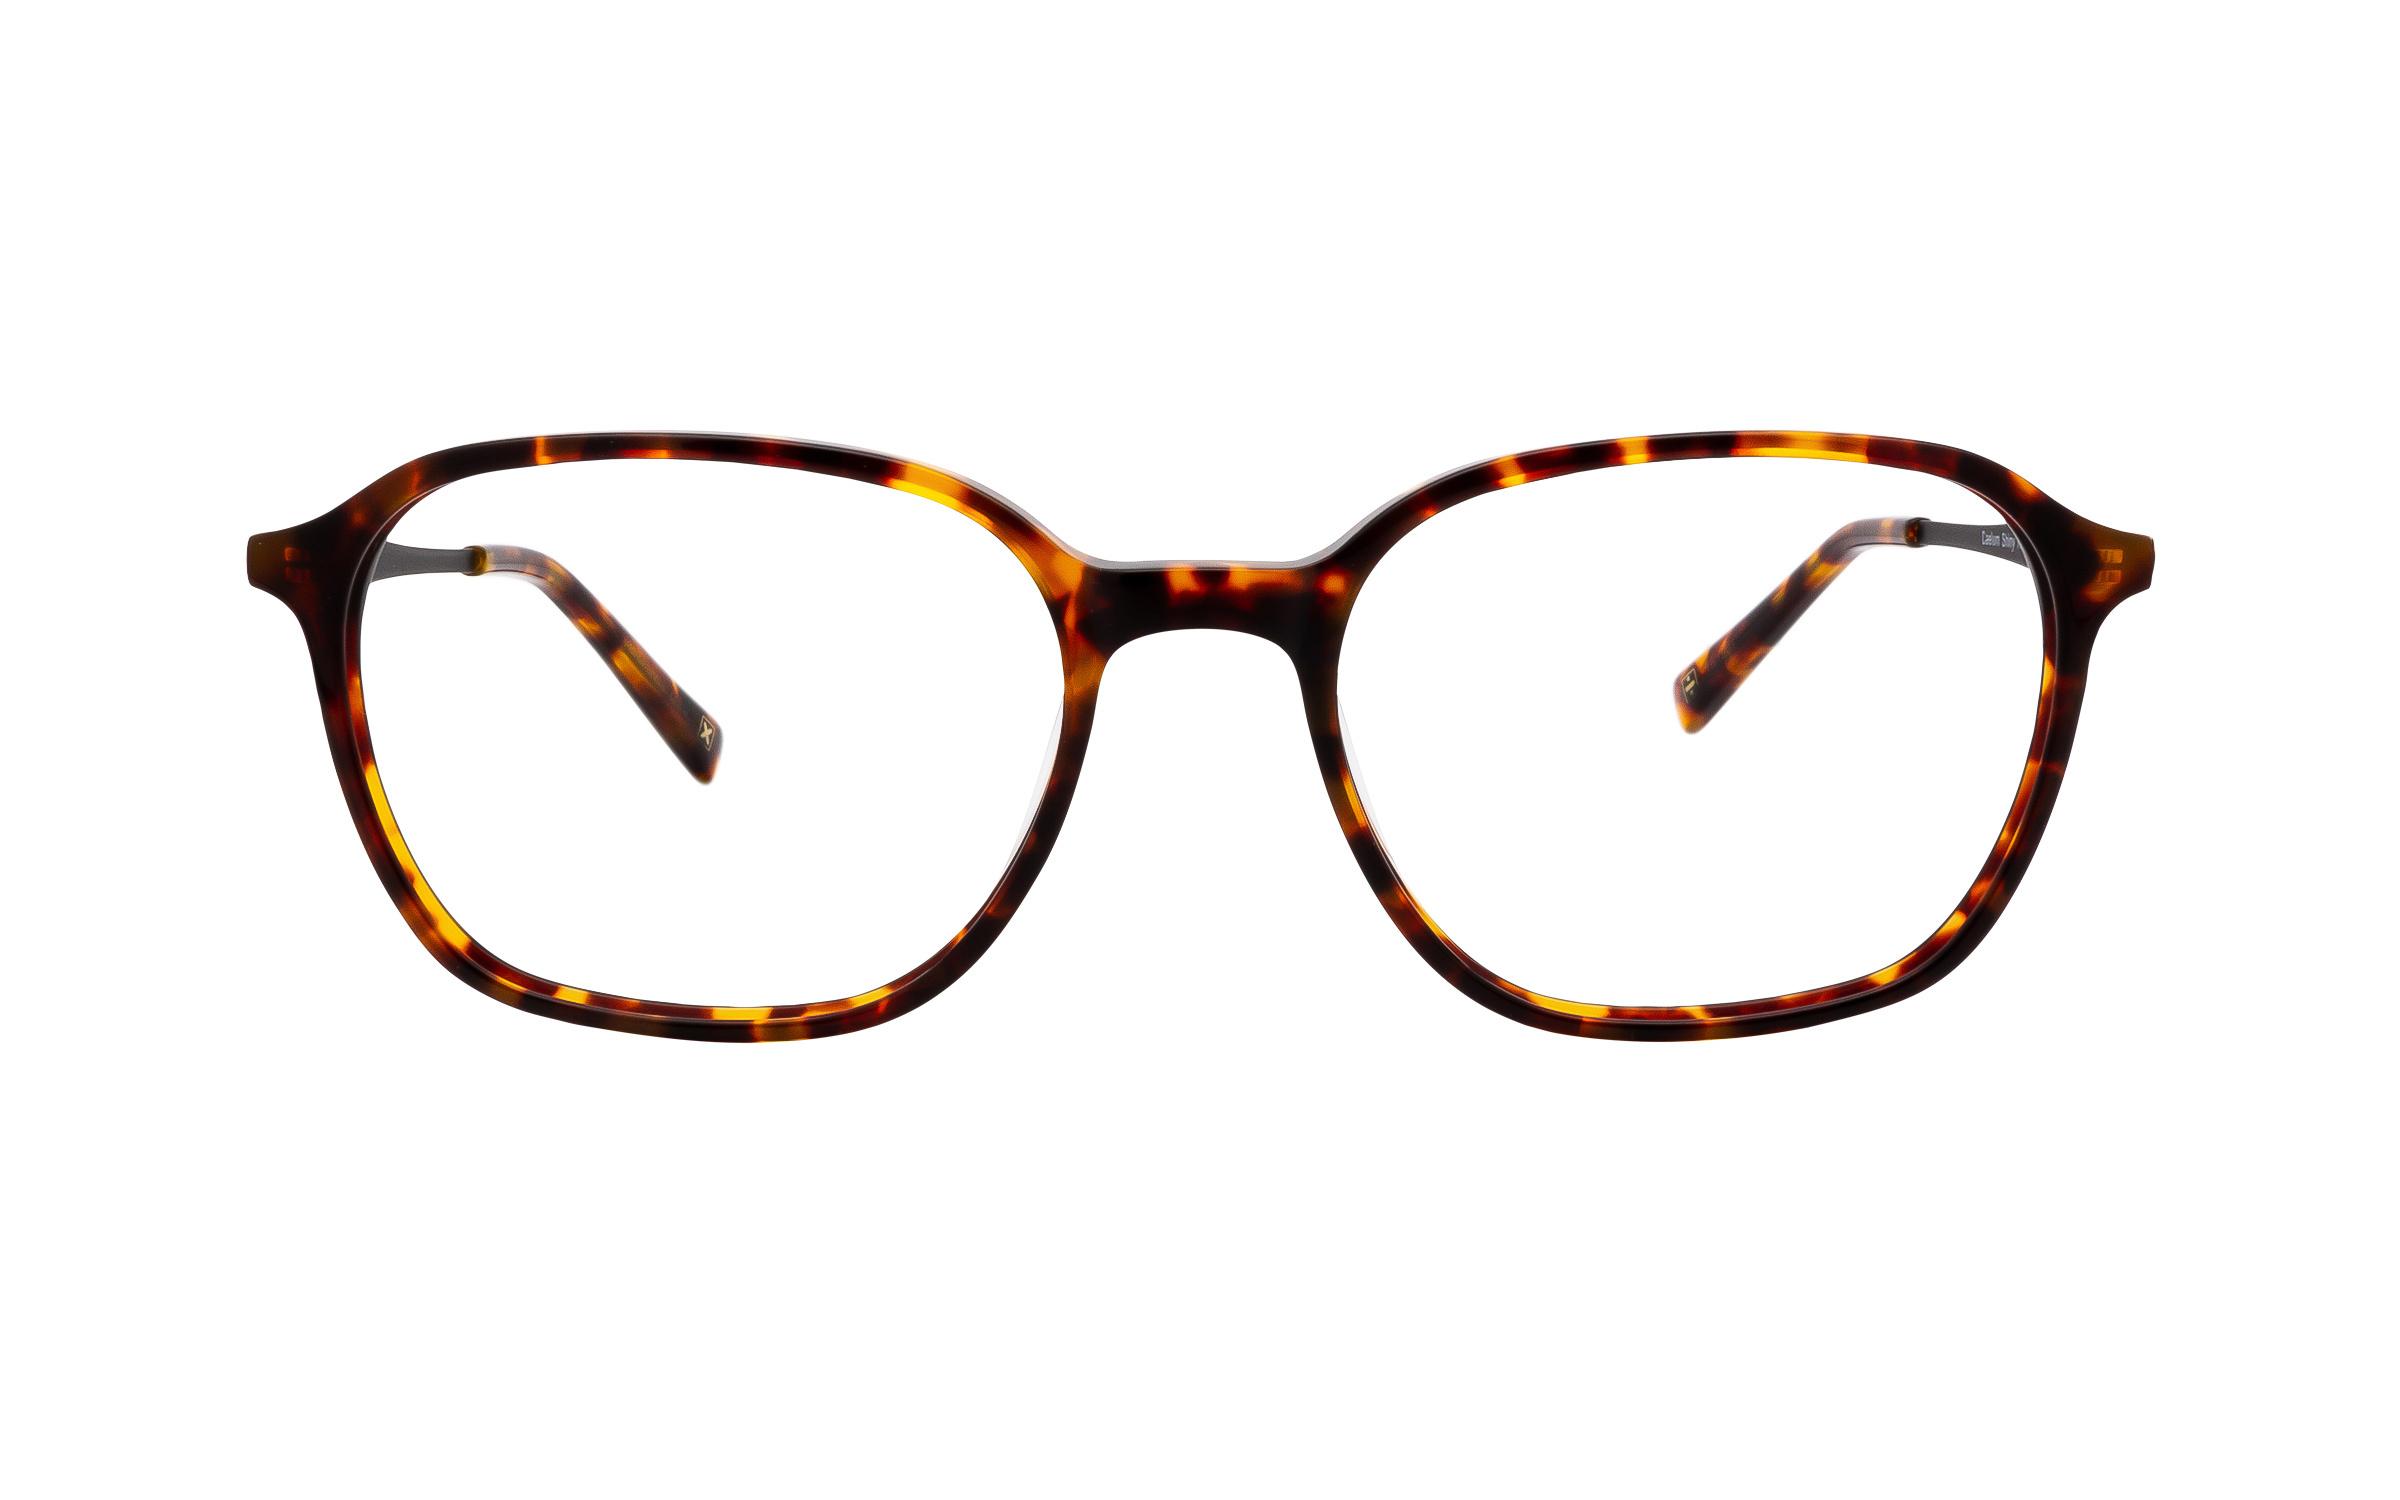 http://www.coastal.com/ - Derek Cardigan Caelum DC236 C02 (53) Eyeglasses and Frame in Shiny Havana Tortoise | Acetate – Online Coastal